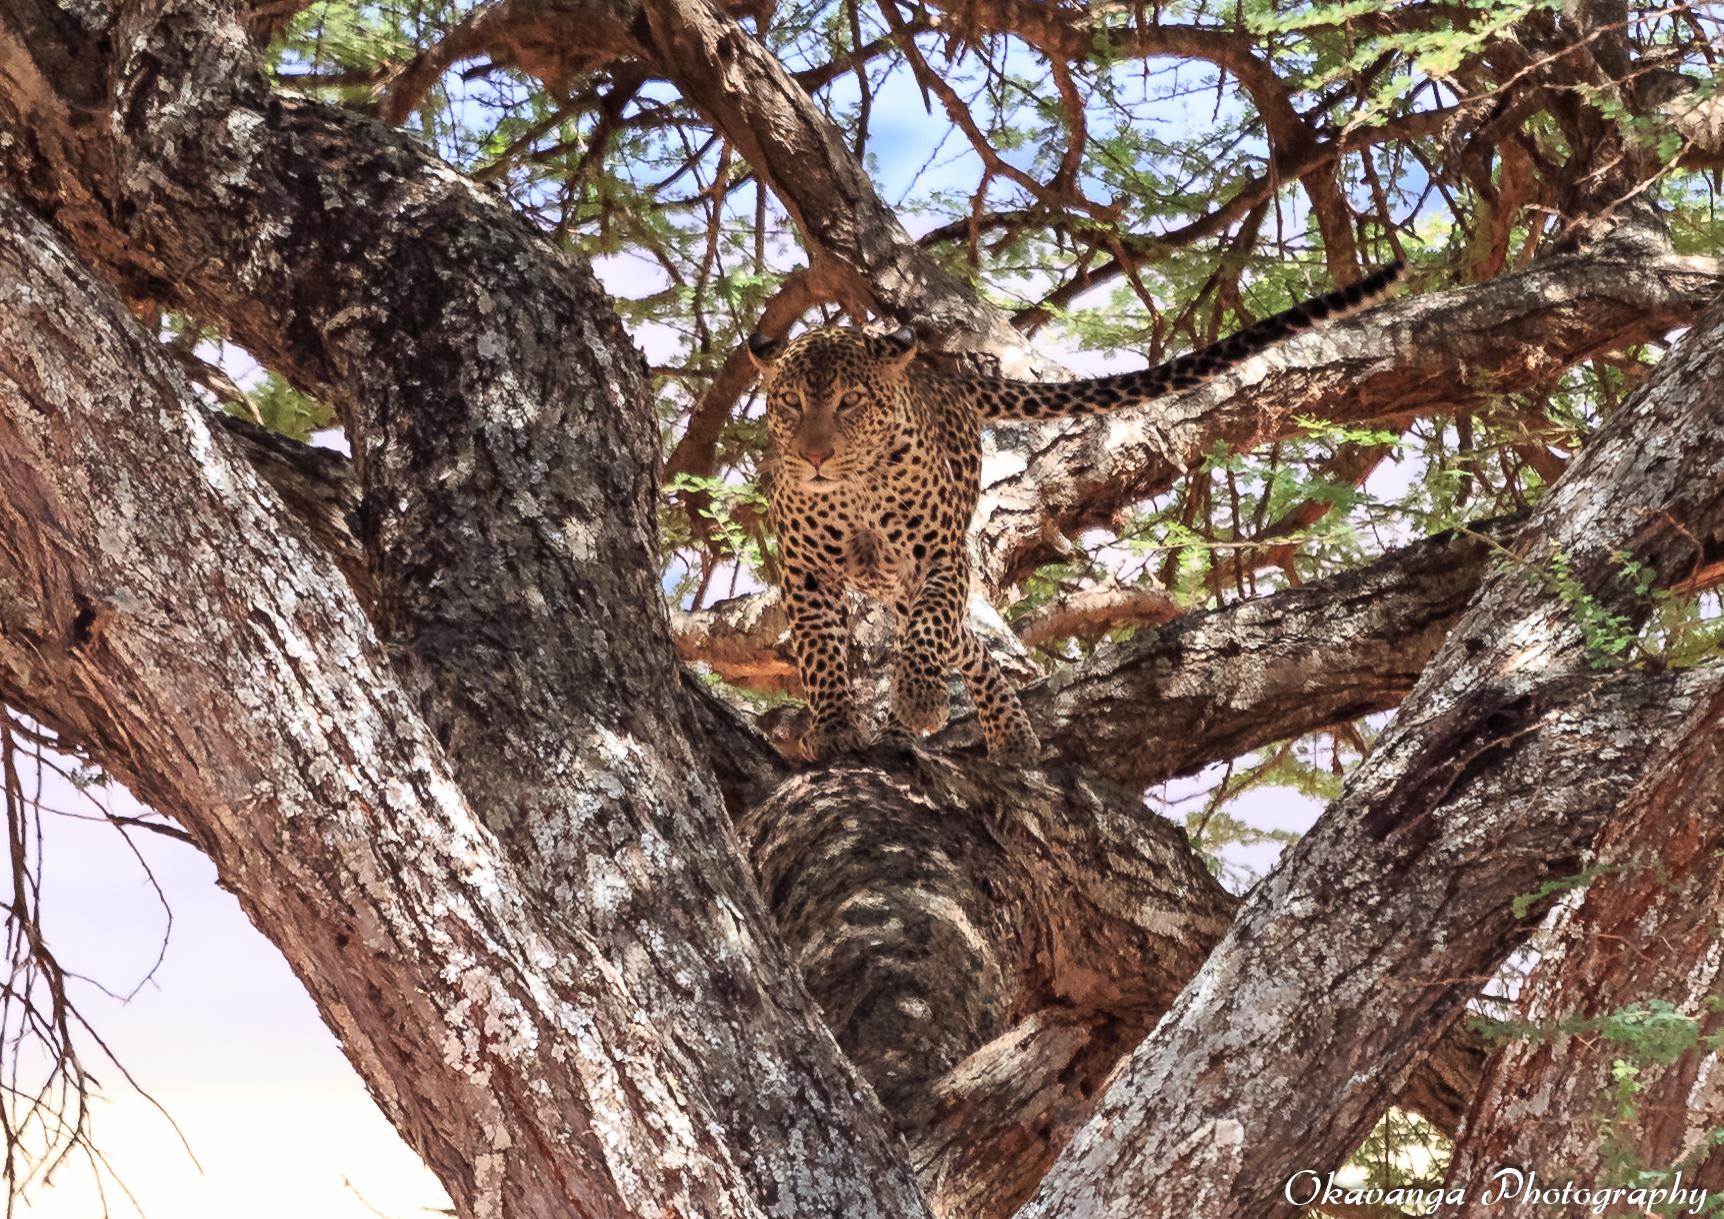 Leopard in Umbrella Tree by Okavanga